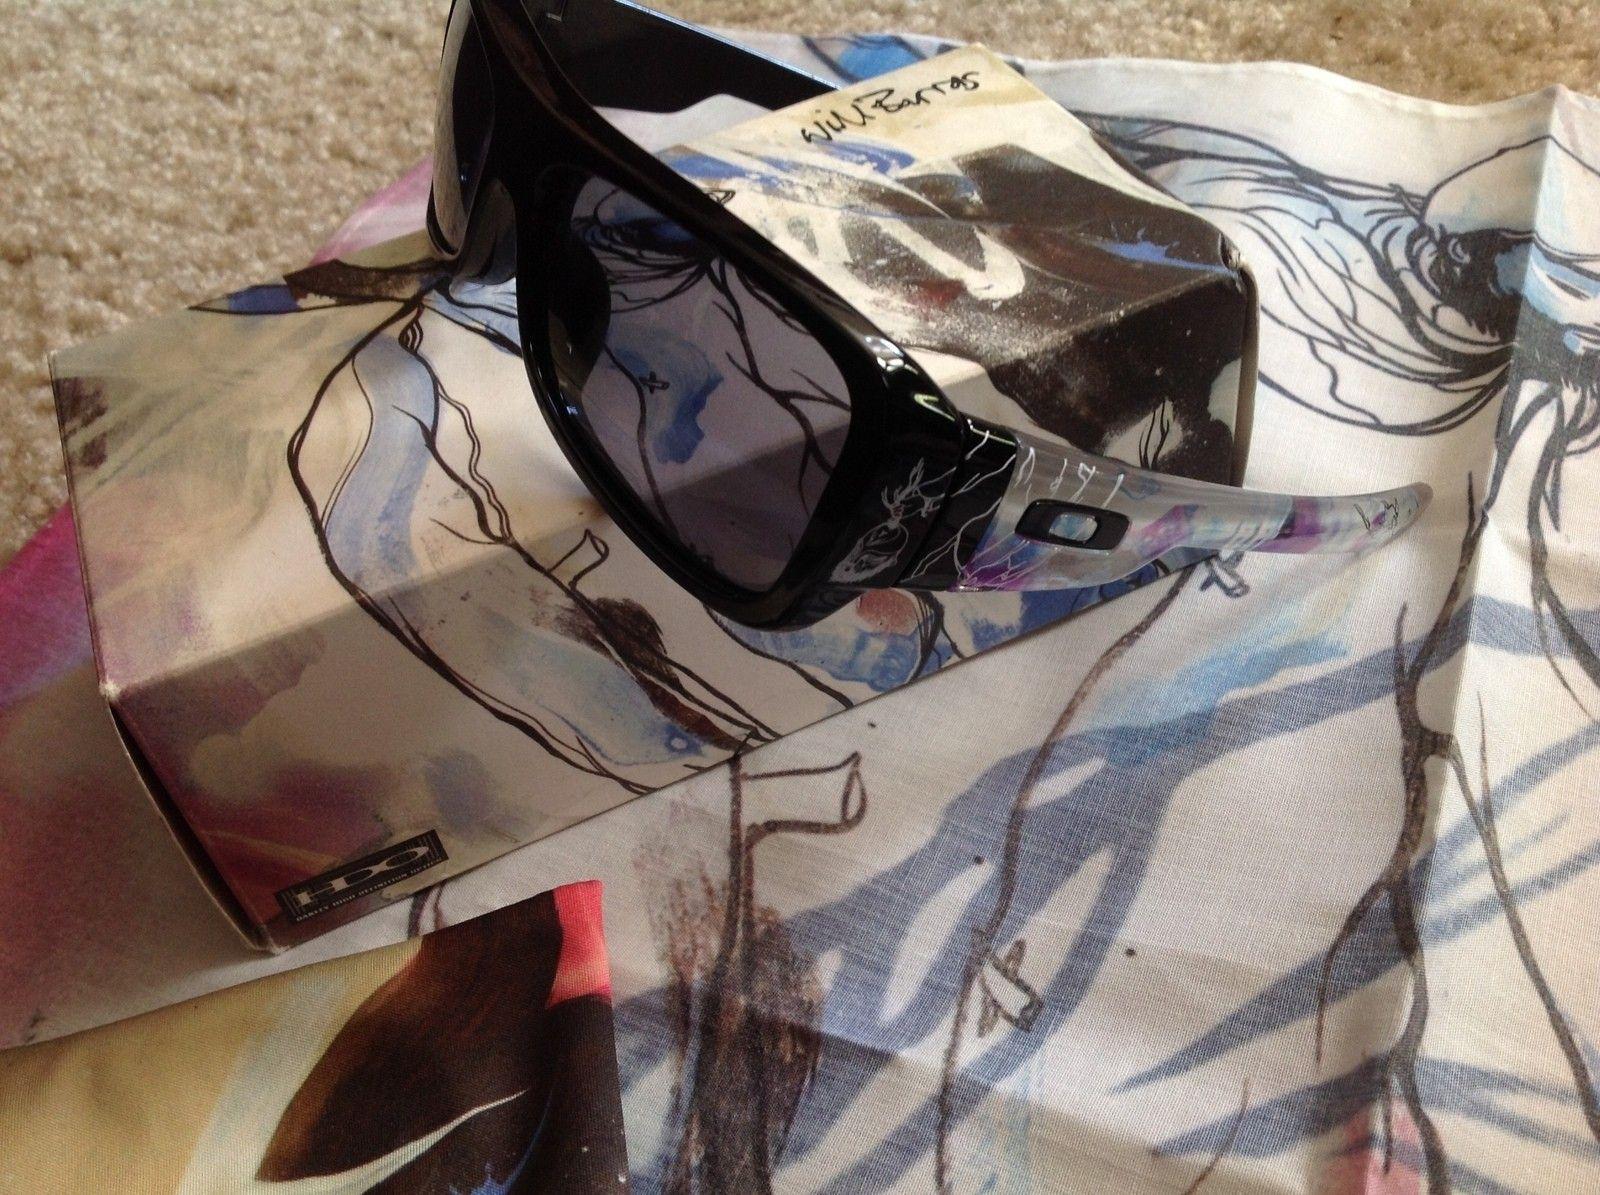 Oakley will Barras monte frio NIB $140 - image.jpeg